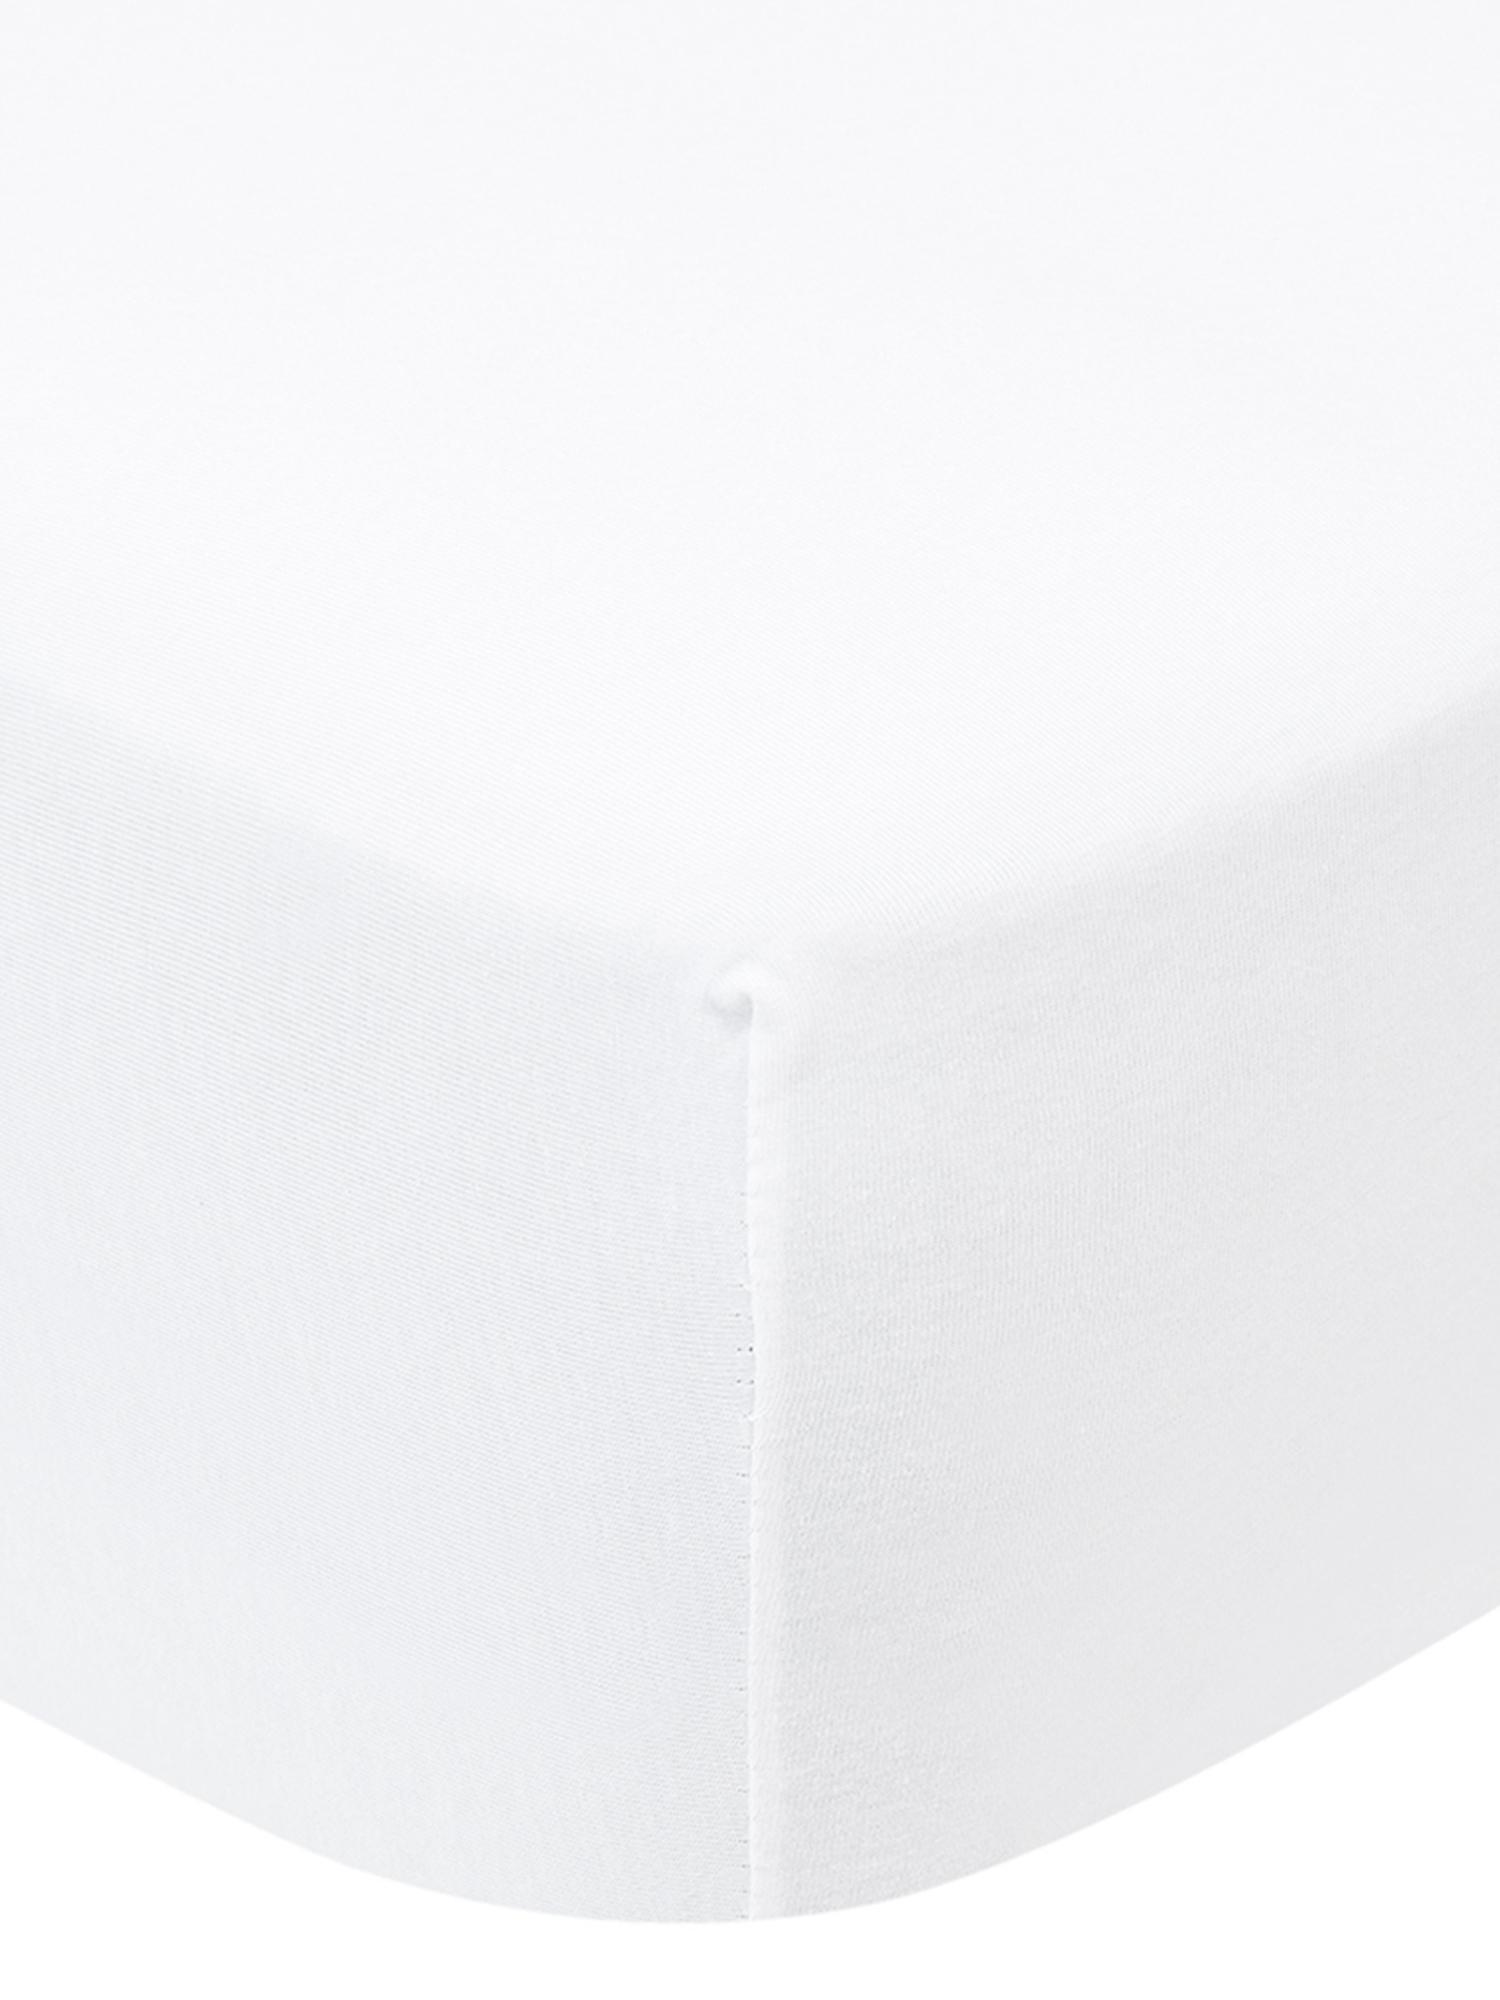 Boxspring-Spannbettlaken Lara, Jersey-Elasthan, 95% Baumwolle, 5% Elasthan, Weiß, 200 x 200 cm